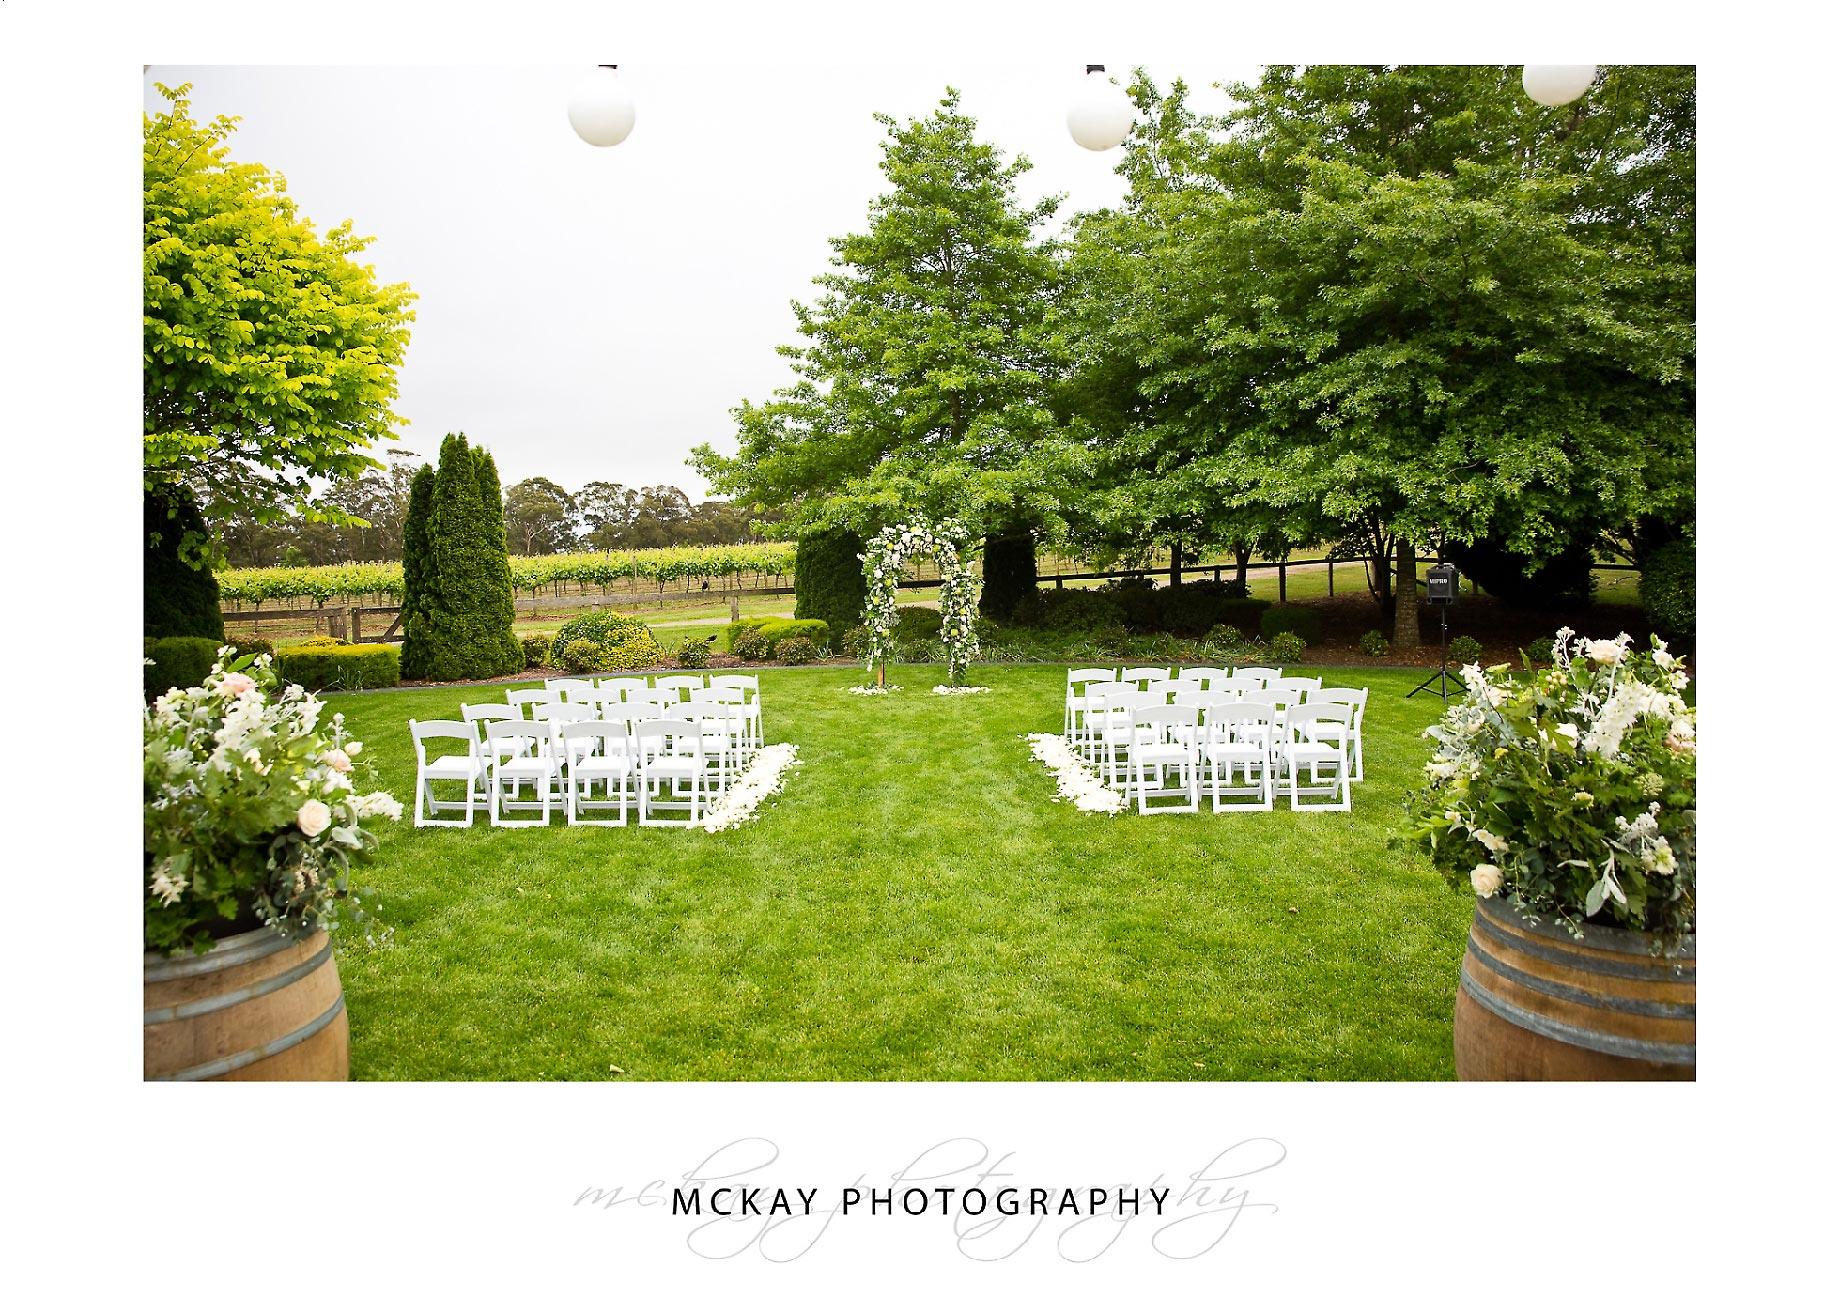 Centennial Vineyards wedding ceremony set up on lawn